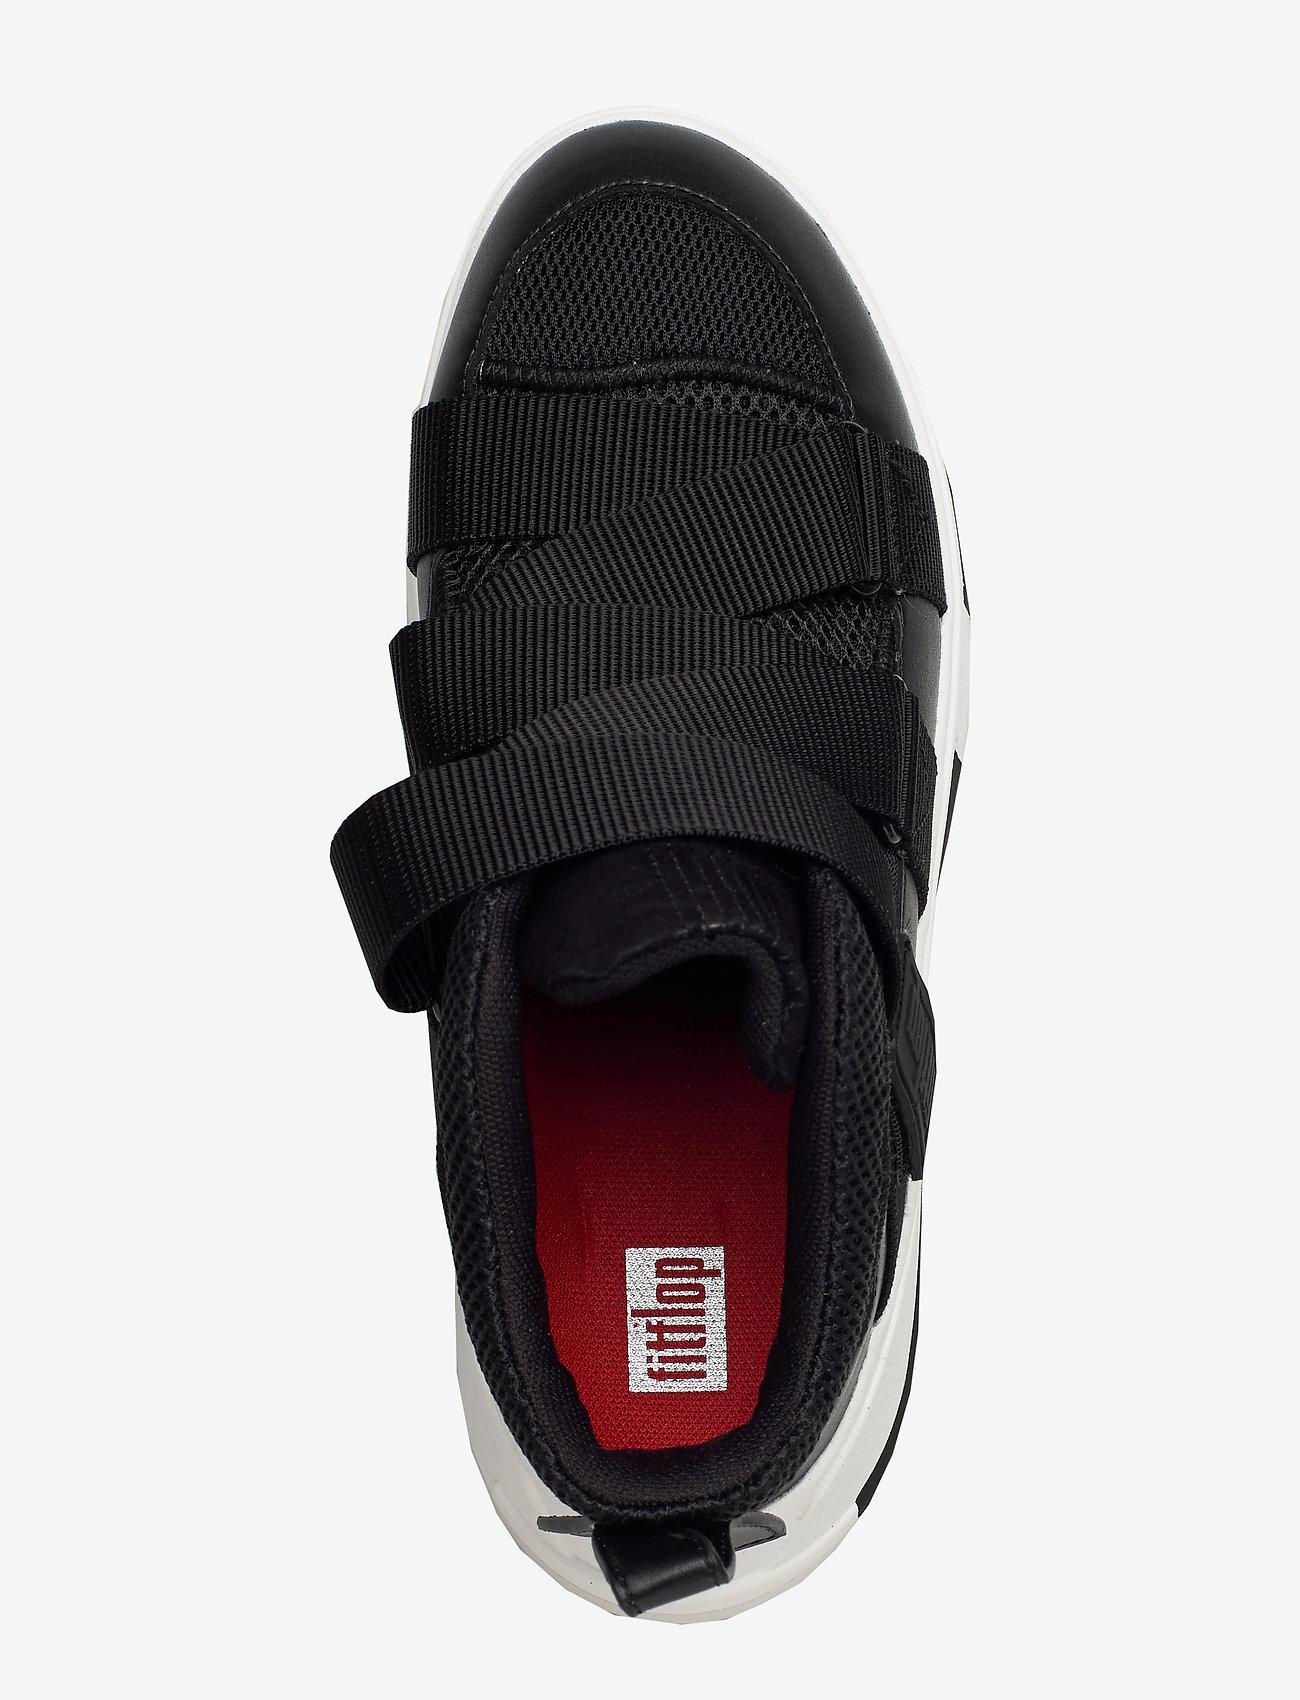 Andrea Adjustable Sneakers (Black Mix) - FitFlop